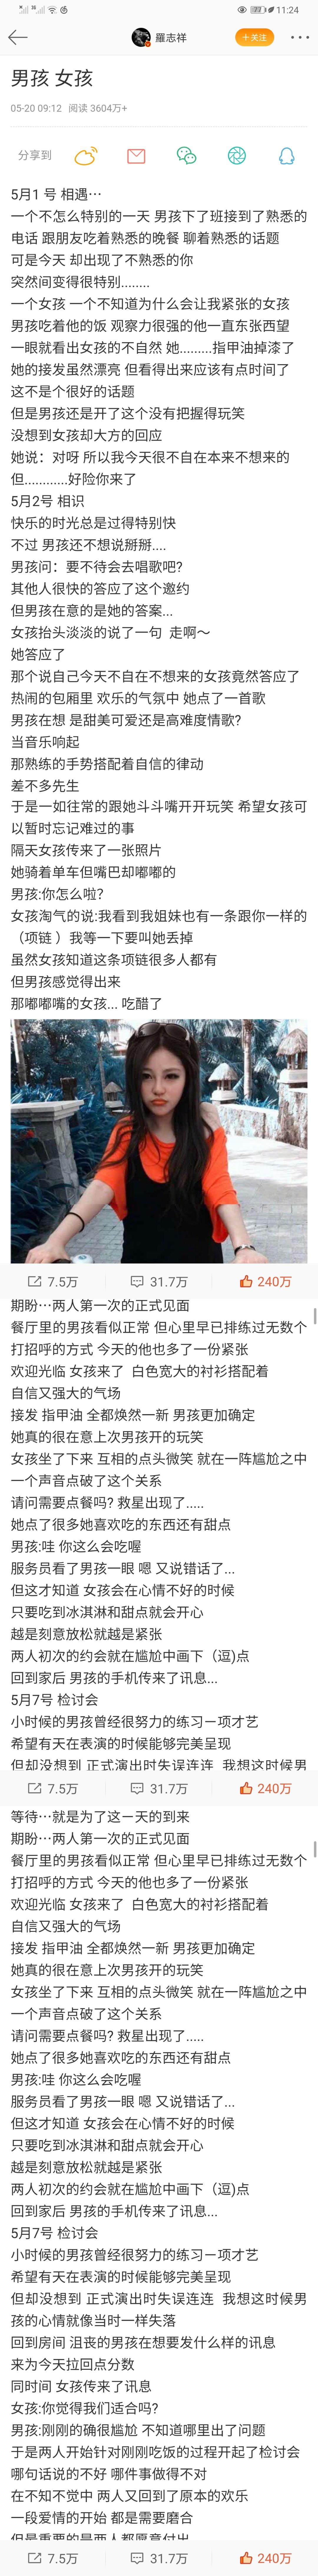 Screenshot_20200520_112417_com.sina.weibo.jpg